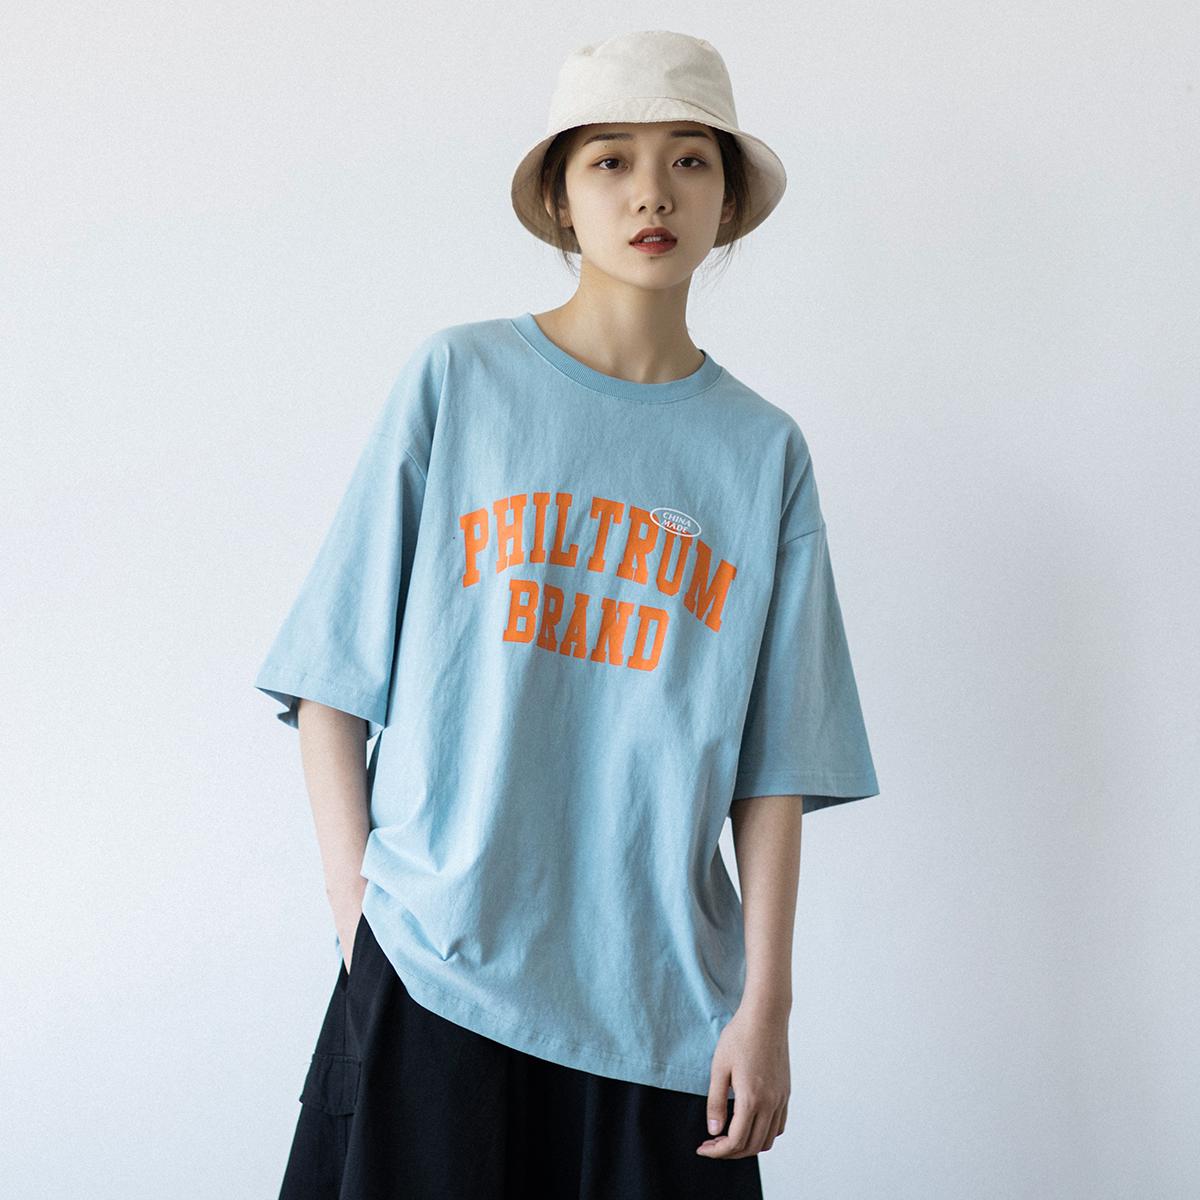 EpicSocotra日系街头bf风纯棉男女滑板印花字母T恤中性短袖体恤衫